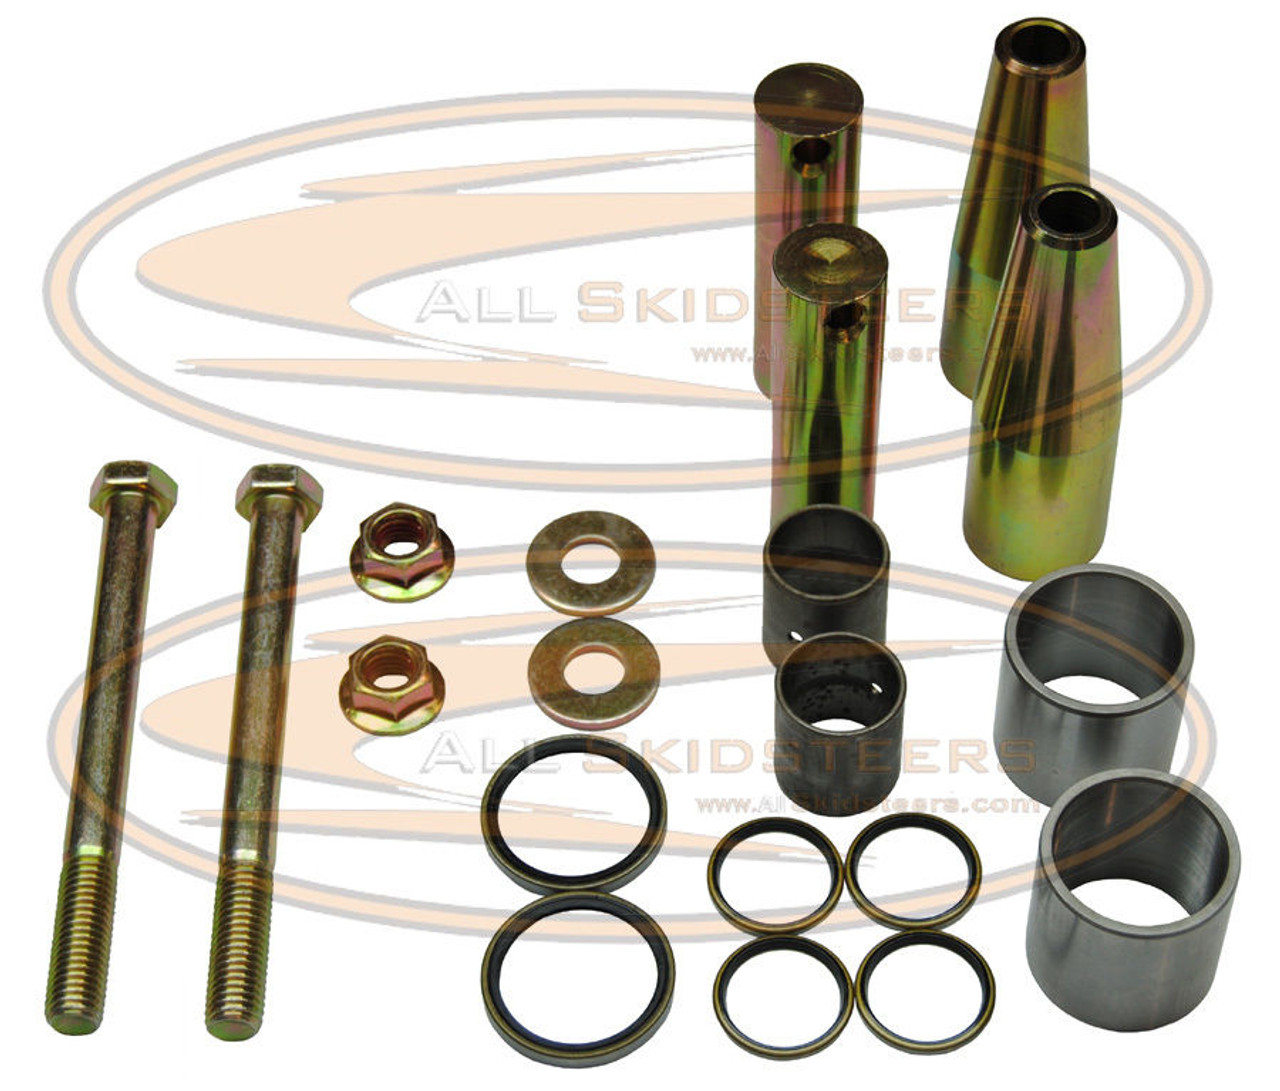 hight resolution of d e c bobcat bobtac bolt bushing frame kit large nut pin washer